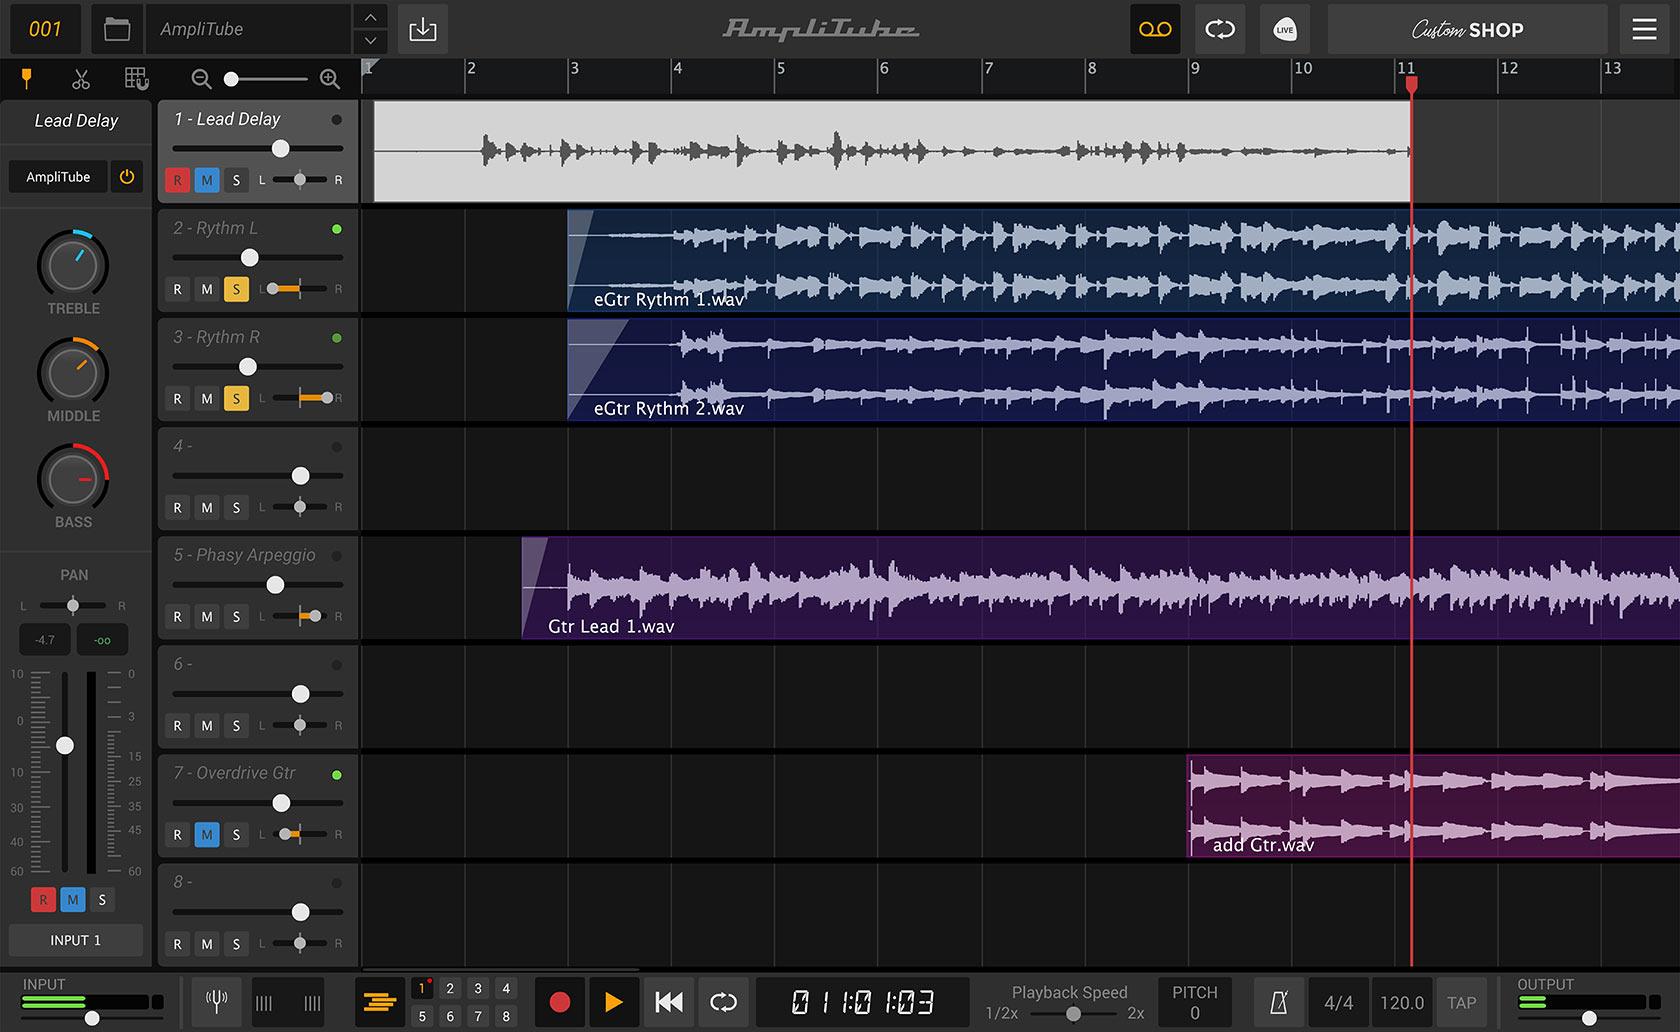 AmpliTube 5 recording